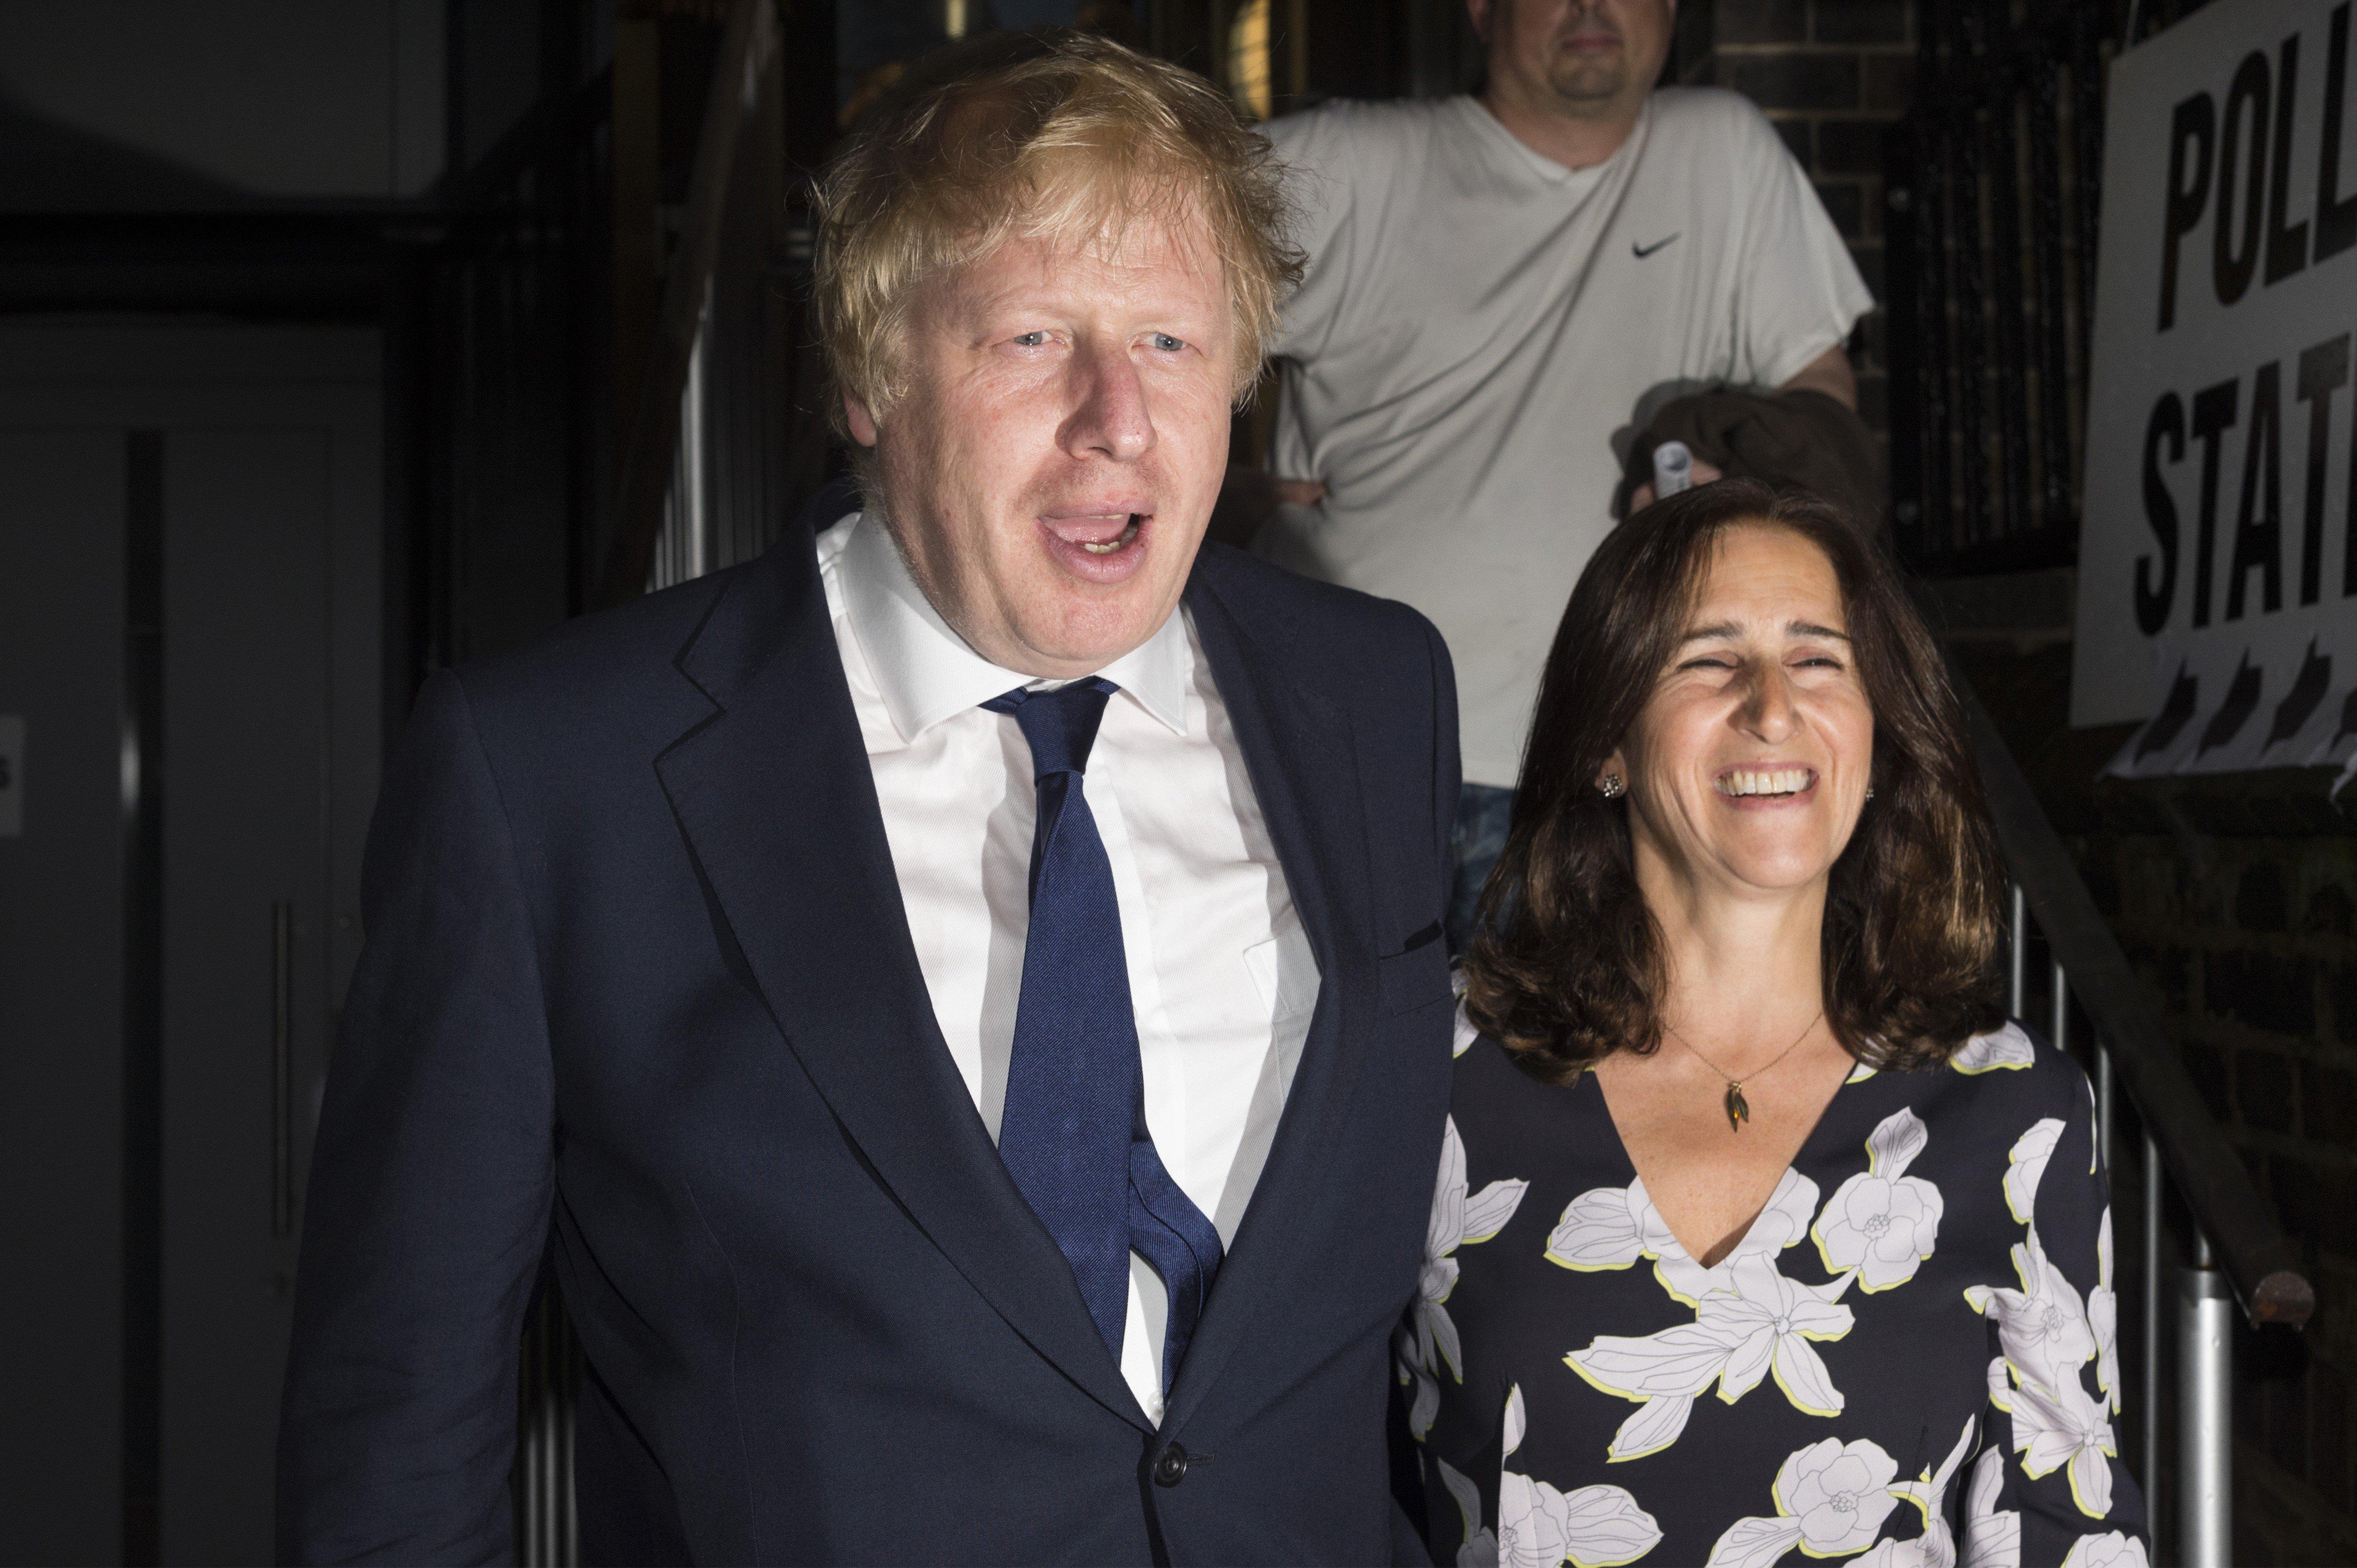 Boris Johnson and wife Marina Wheeler to get divorced